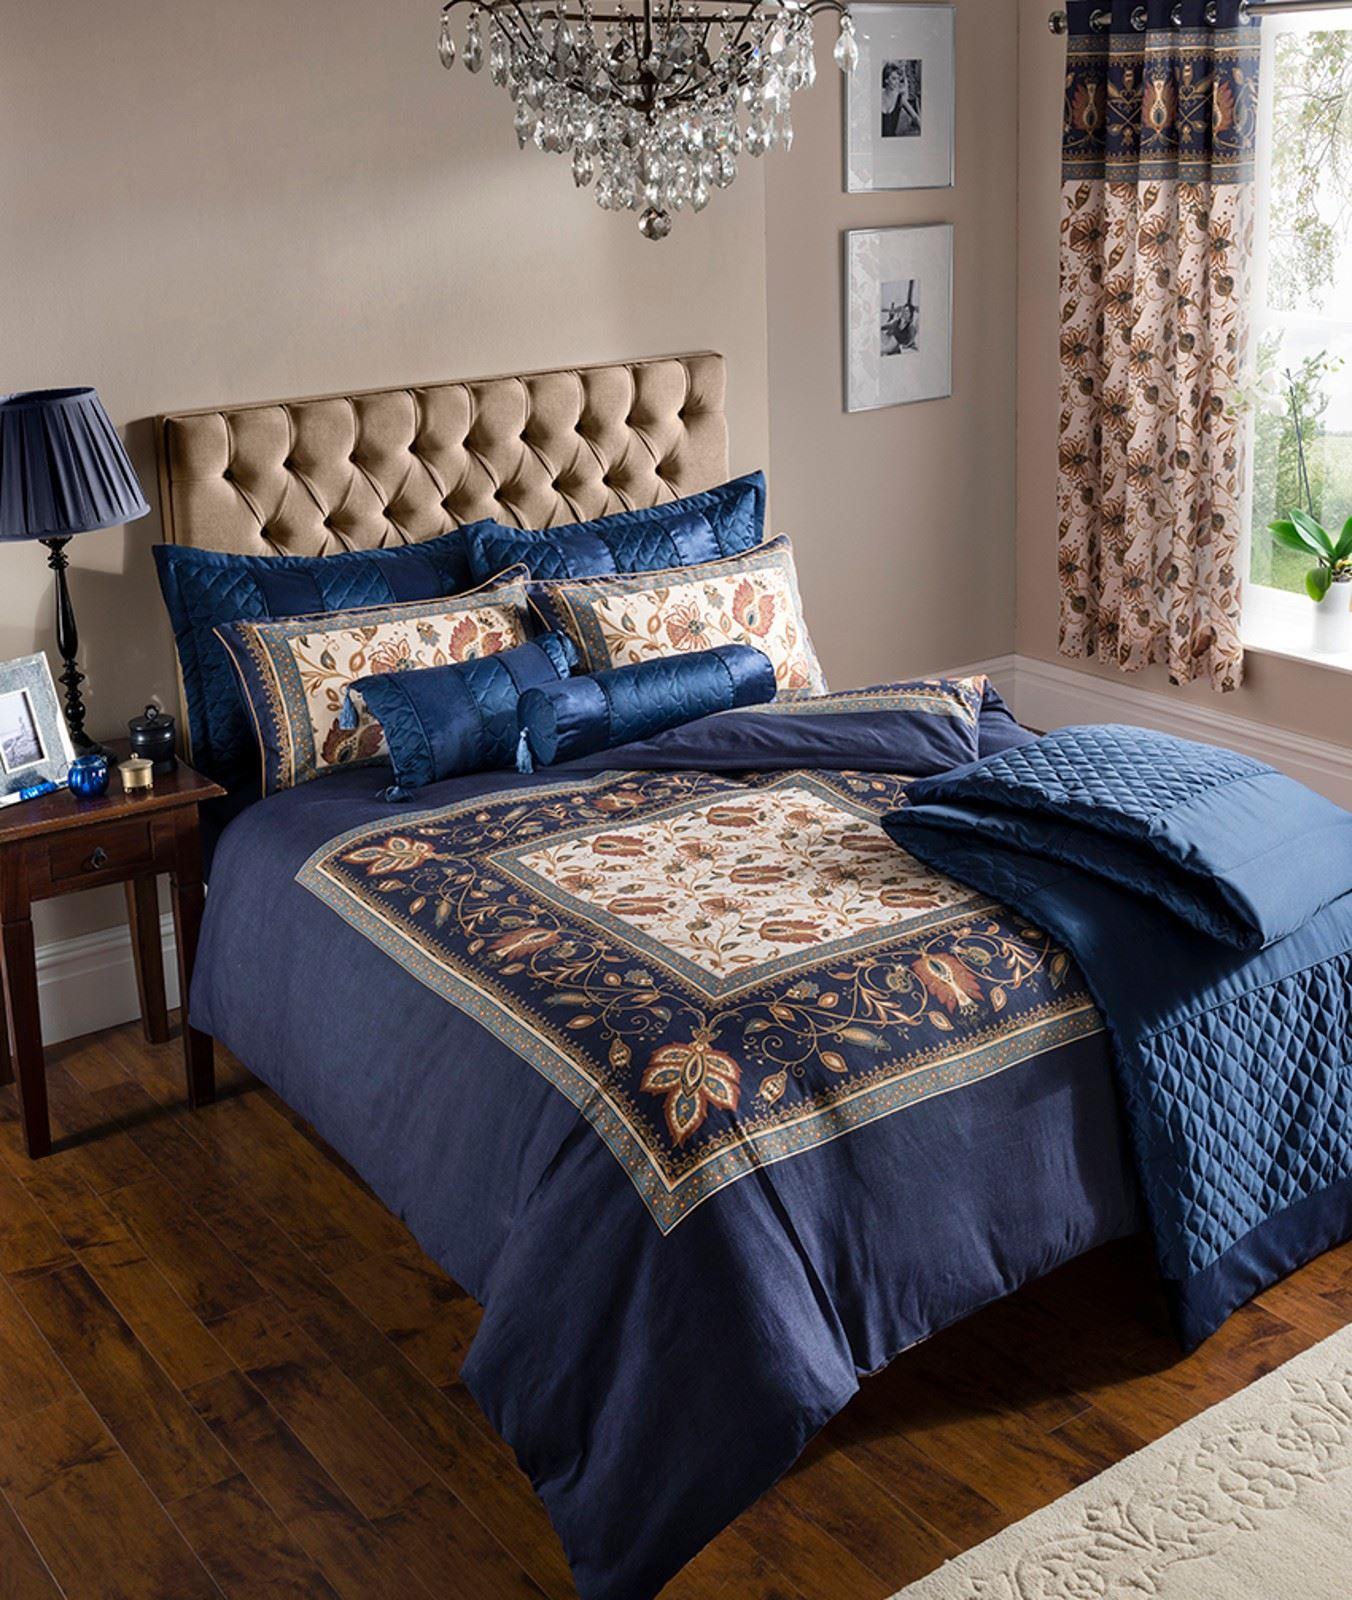 Edred n azul marino ropa de cama juego y o cortinas o cubrecama con algod n ebay - Cortinas azul marino ...